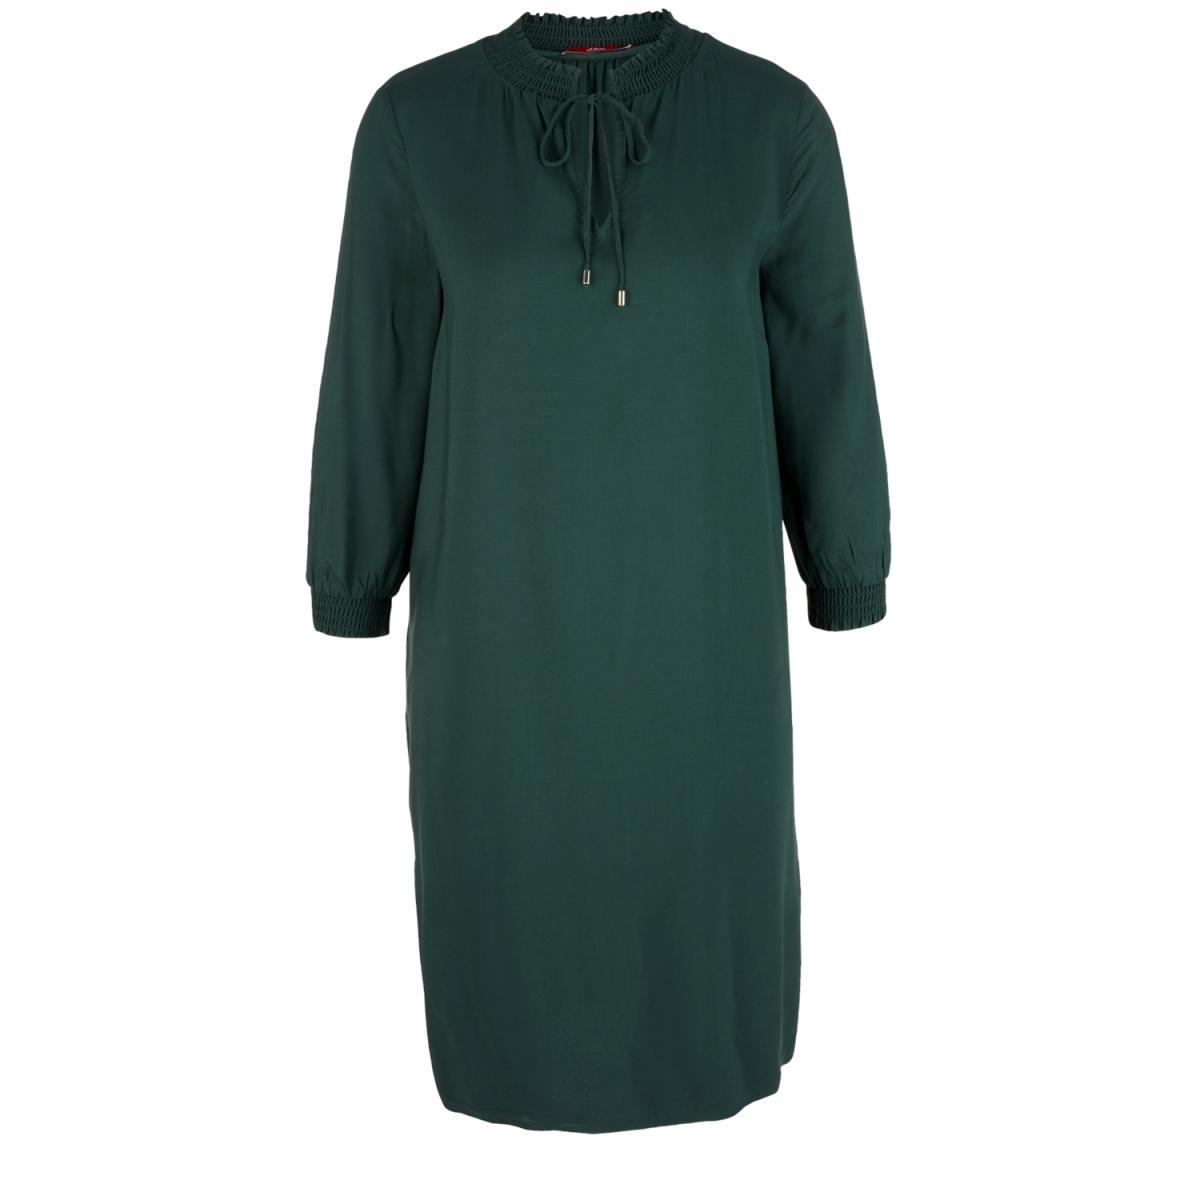 jurk met strikkoord 14908827532 s.oliver jurk 7897